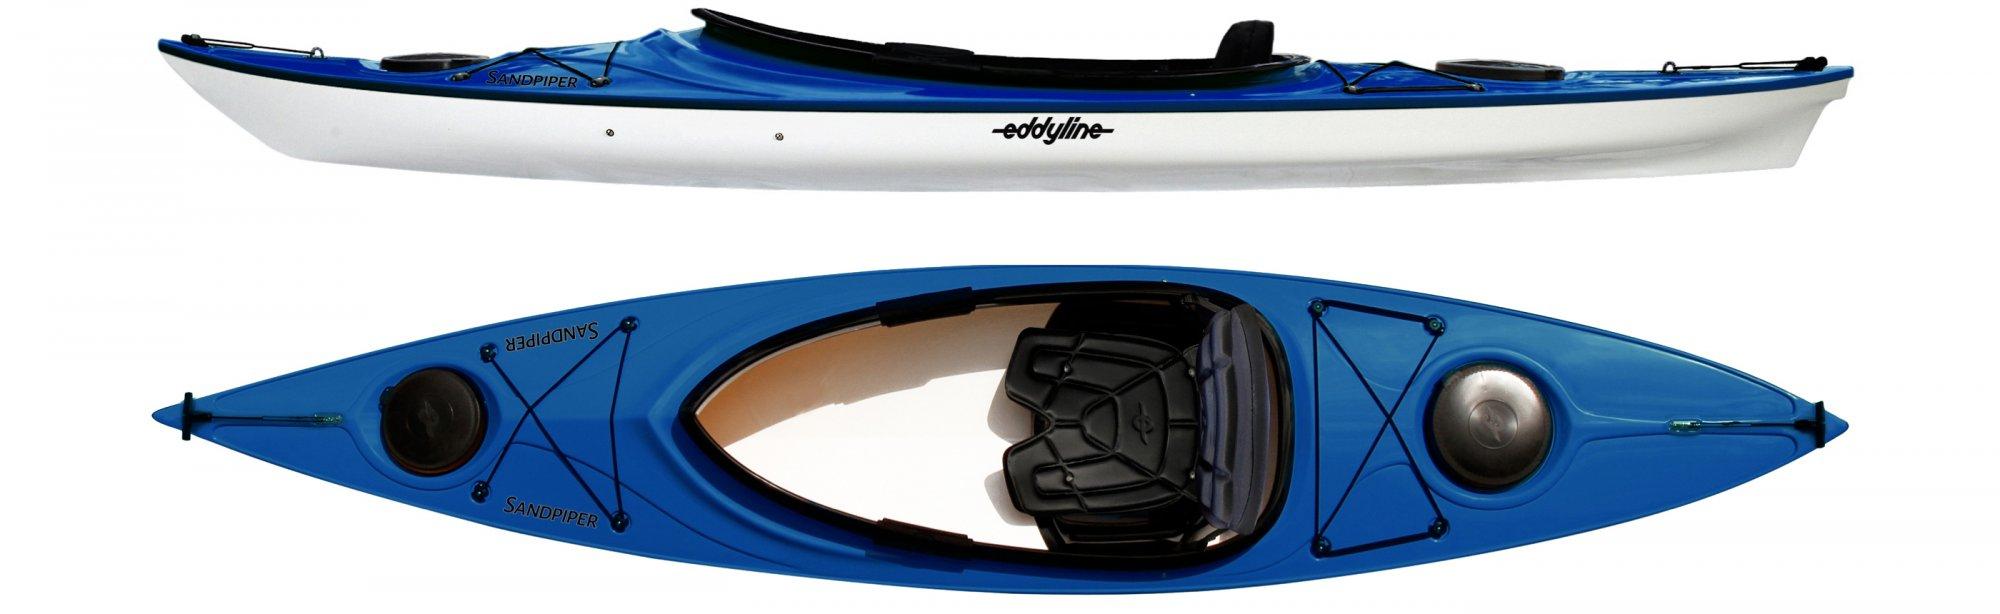 Eddyline Sandpiper 120 - ORDER NEW